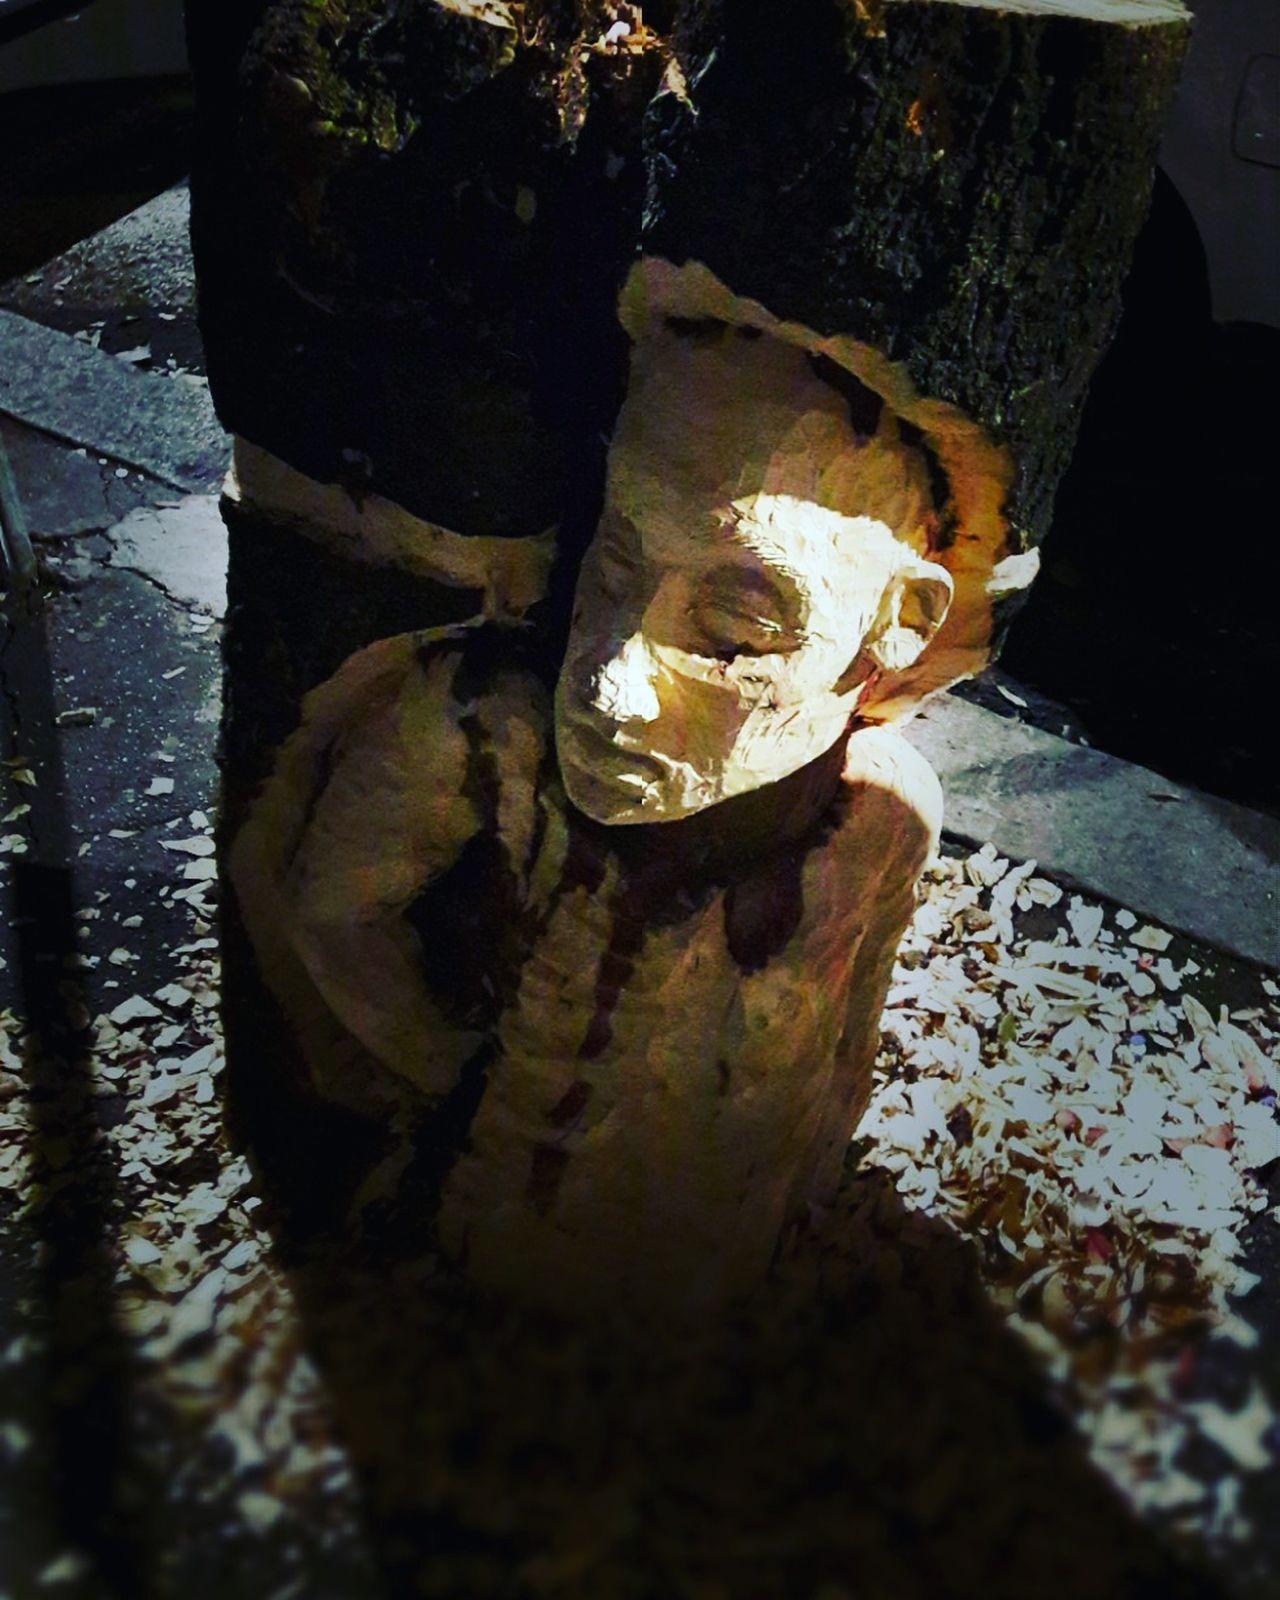 No People Shadow Day Tree Wood Legno Albero Tronco Sculpture Scultura Treecollection Woodwork  Legnolavorato Tronco Cortado Trees Tree Silhouette Wood Art Legnoart Troncofilosofiadivita Tree Trunk Wood - Material Legno Wood Tronco Vivo Sculpture Garden Sculture